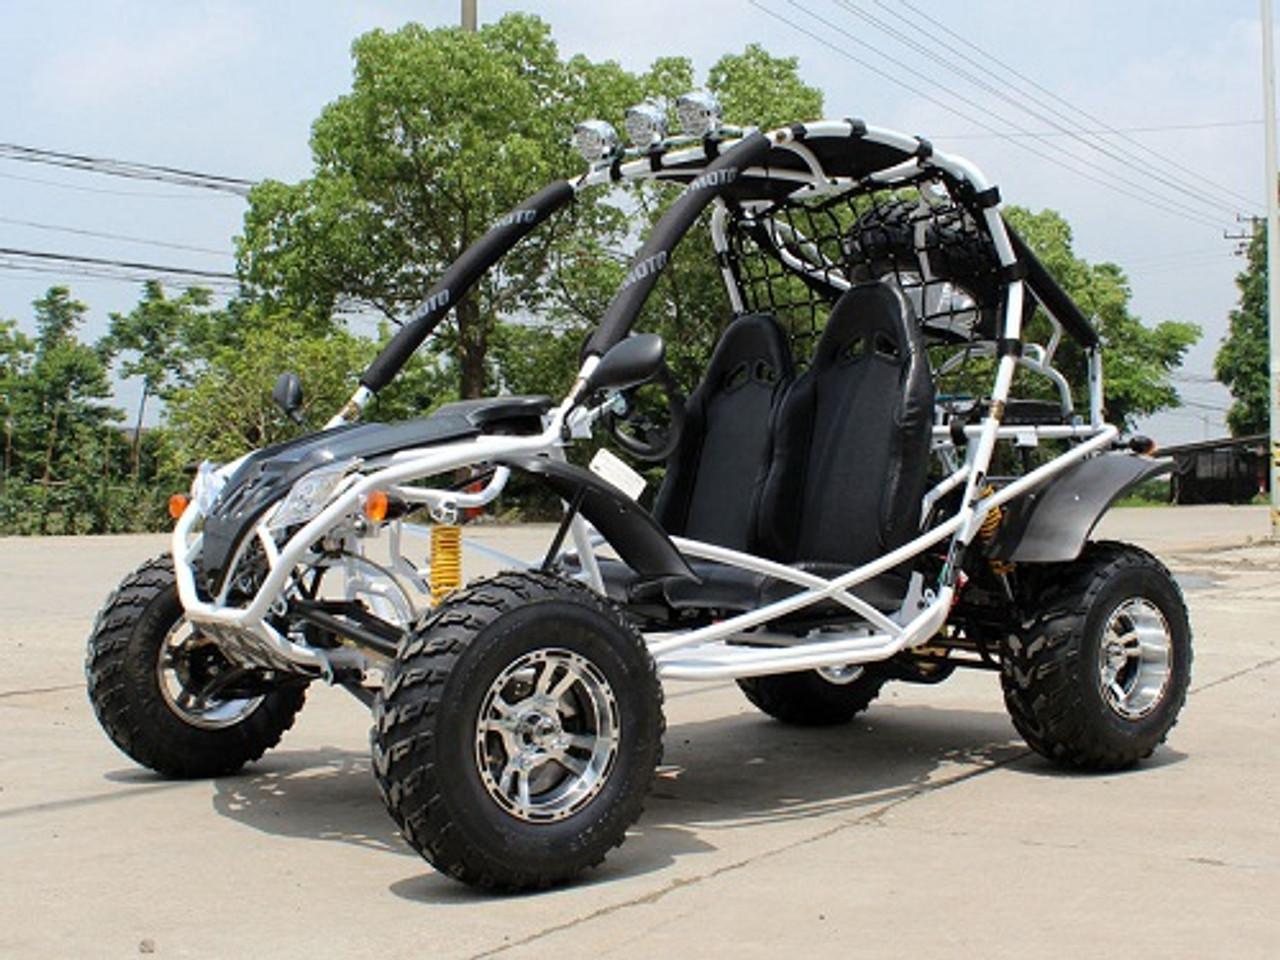 Vitacci JAGUAR-200 (169cc) DELUXE Go Kart